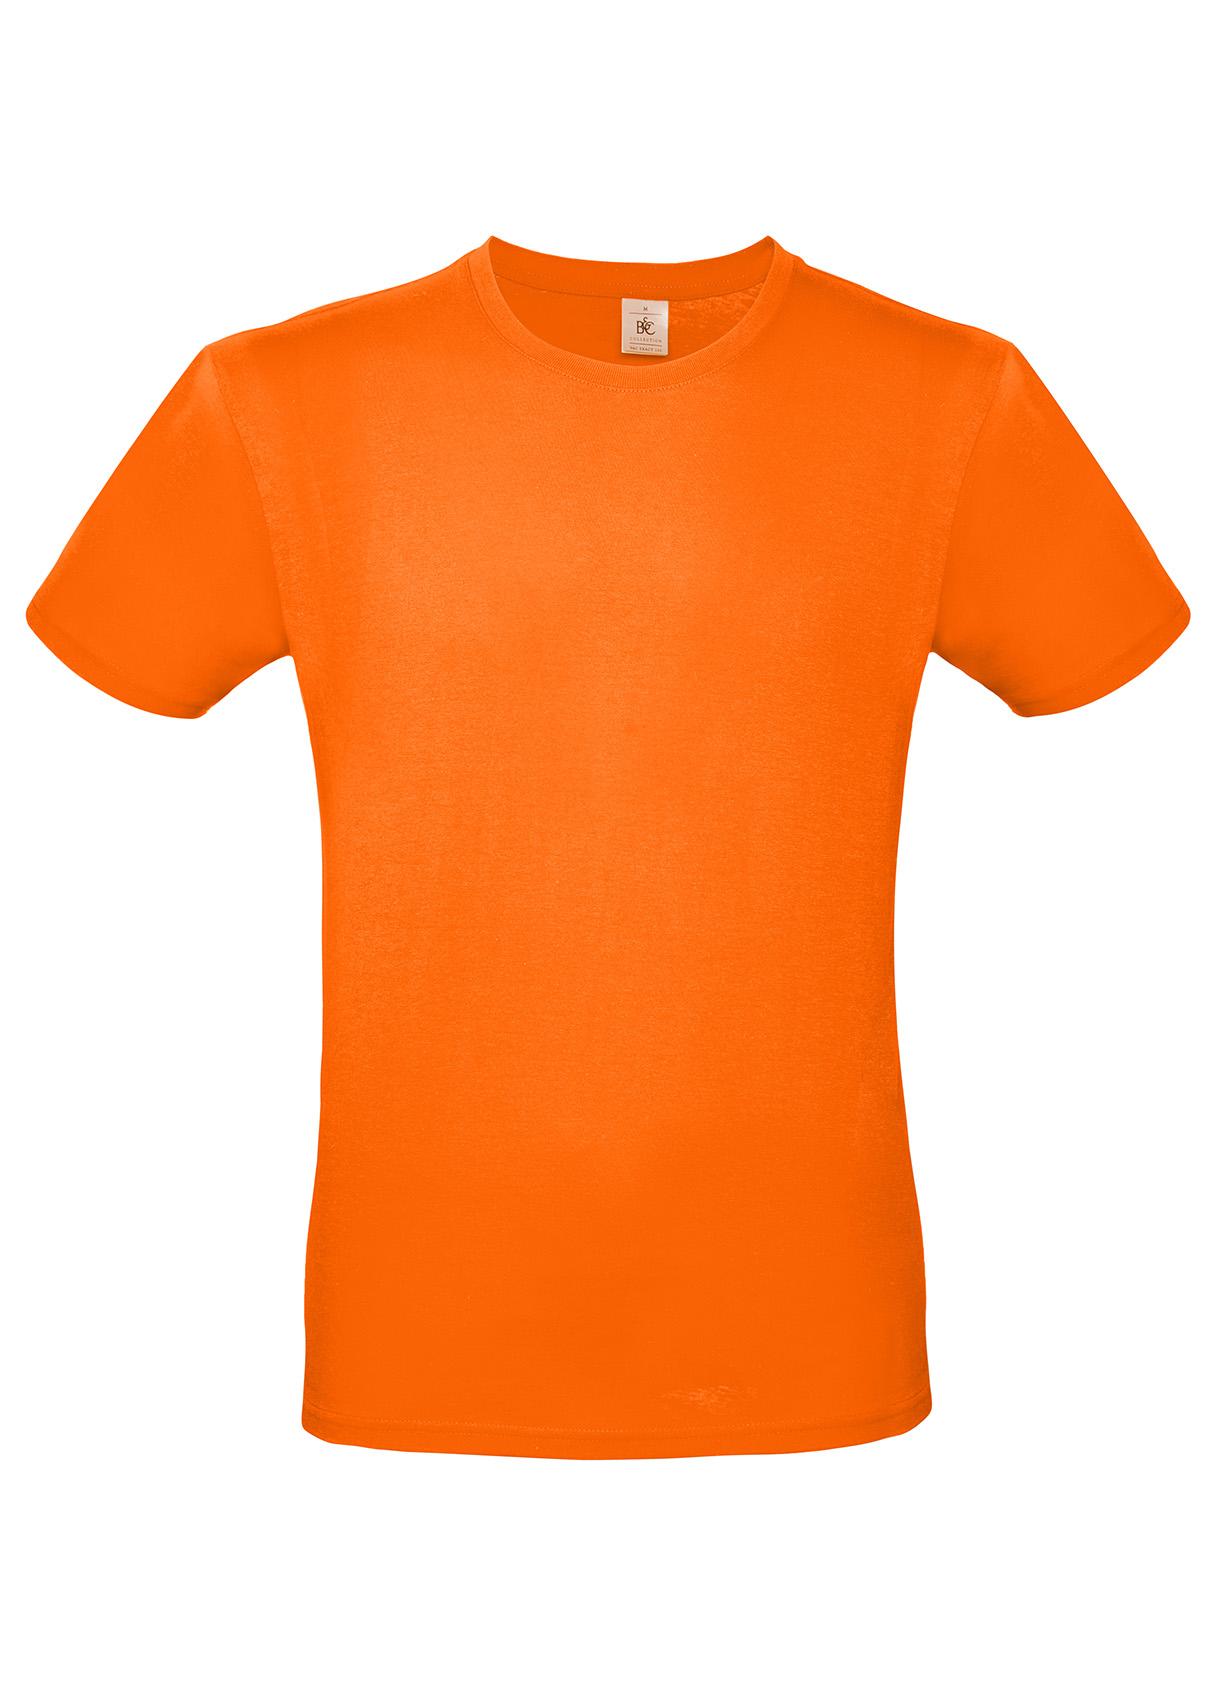 #E150 T Shirt